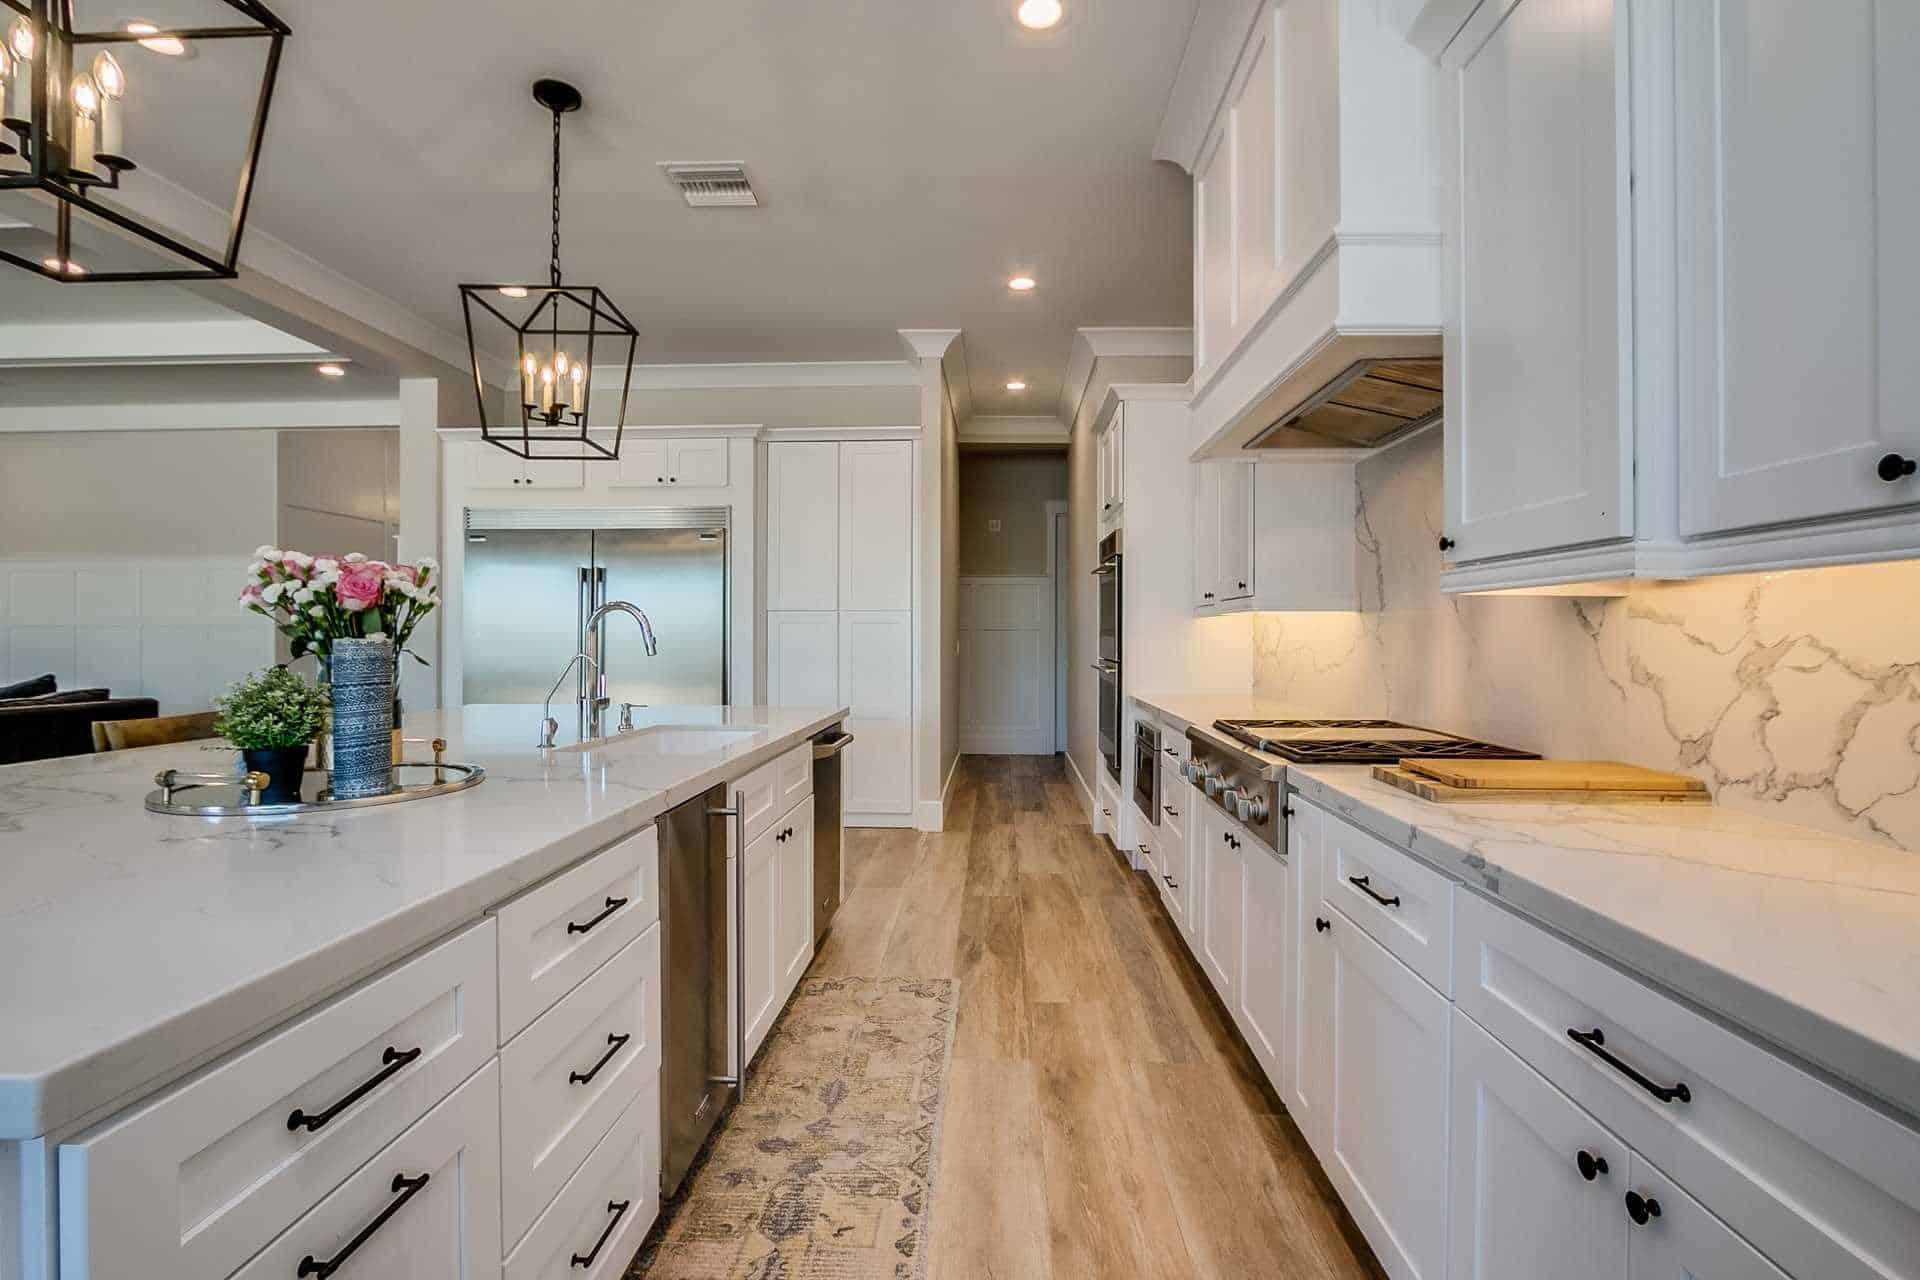 Madera custom kitchen cabinets 3